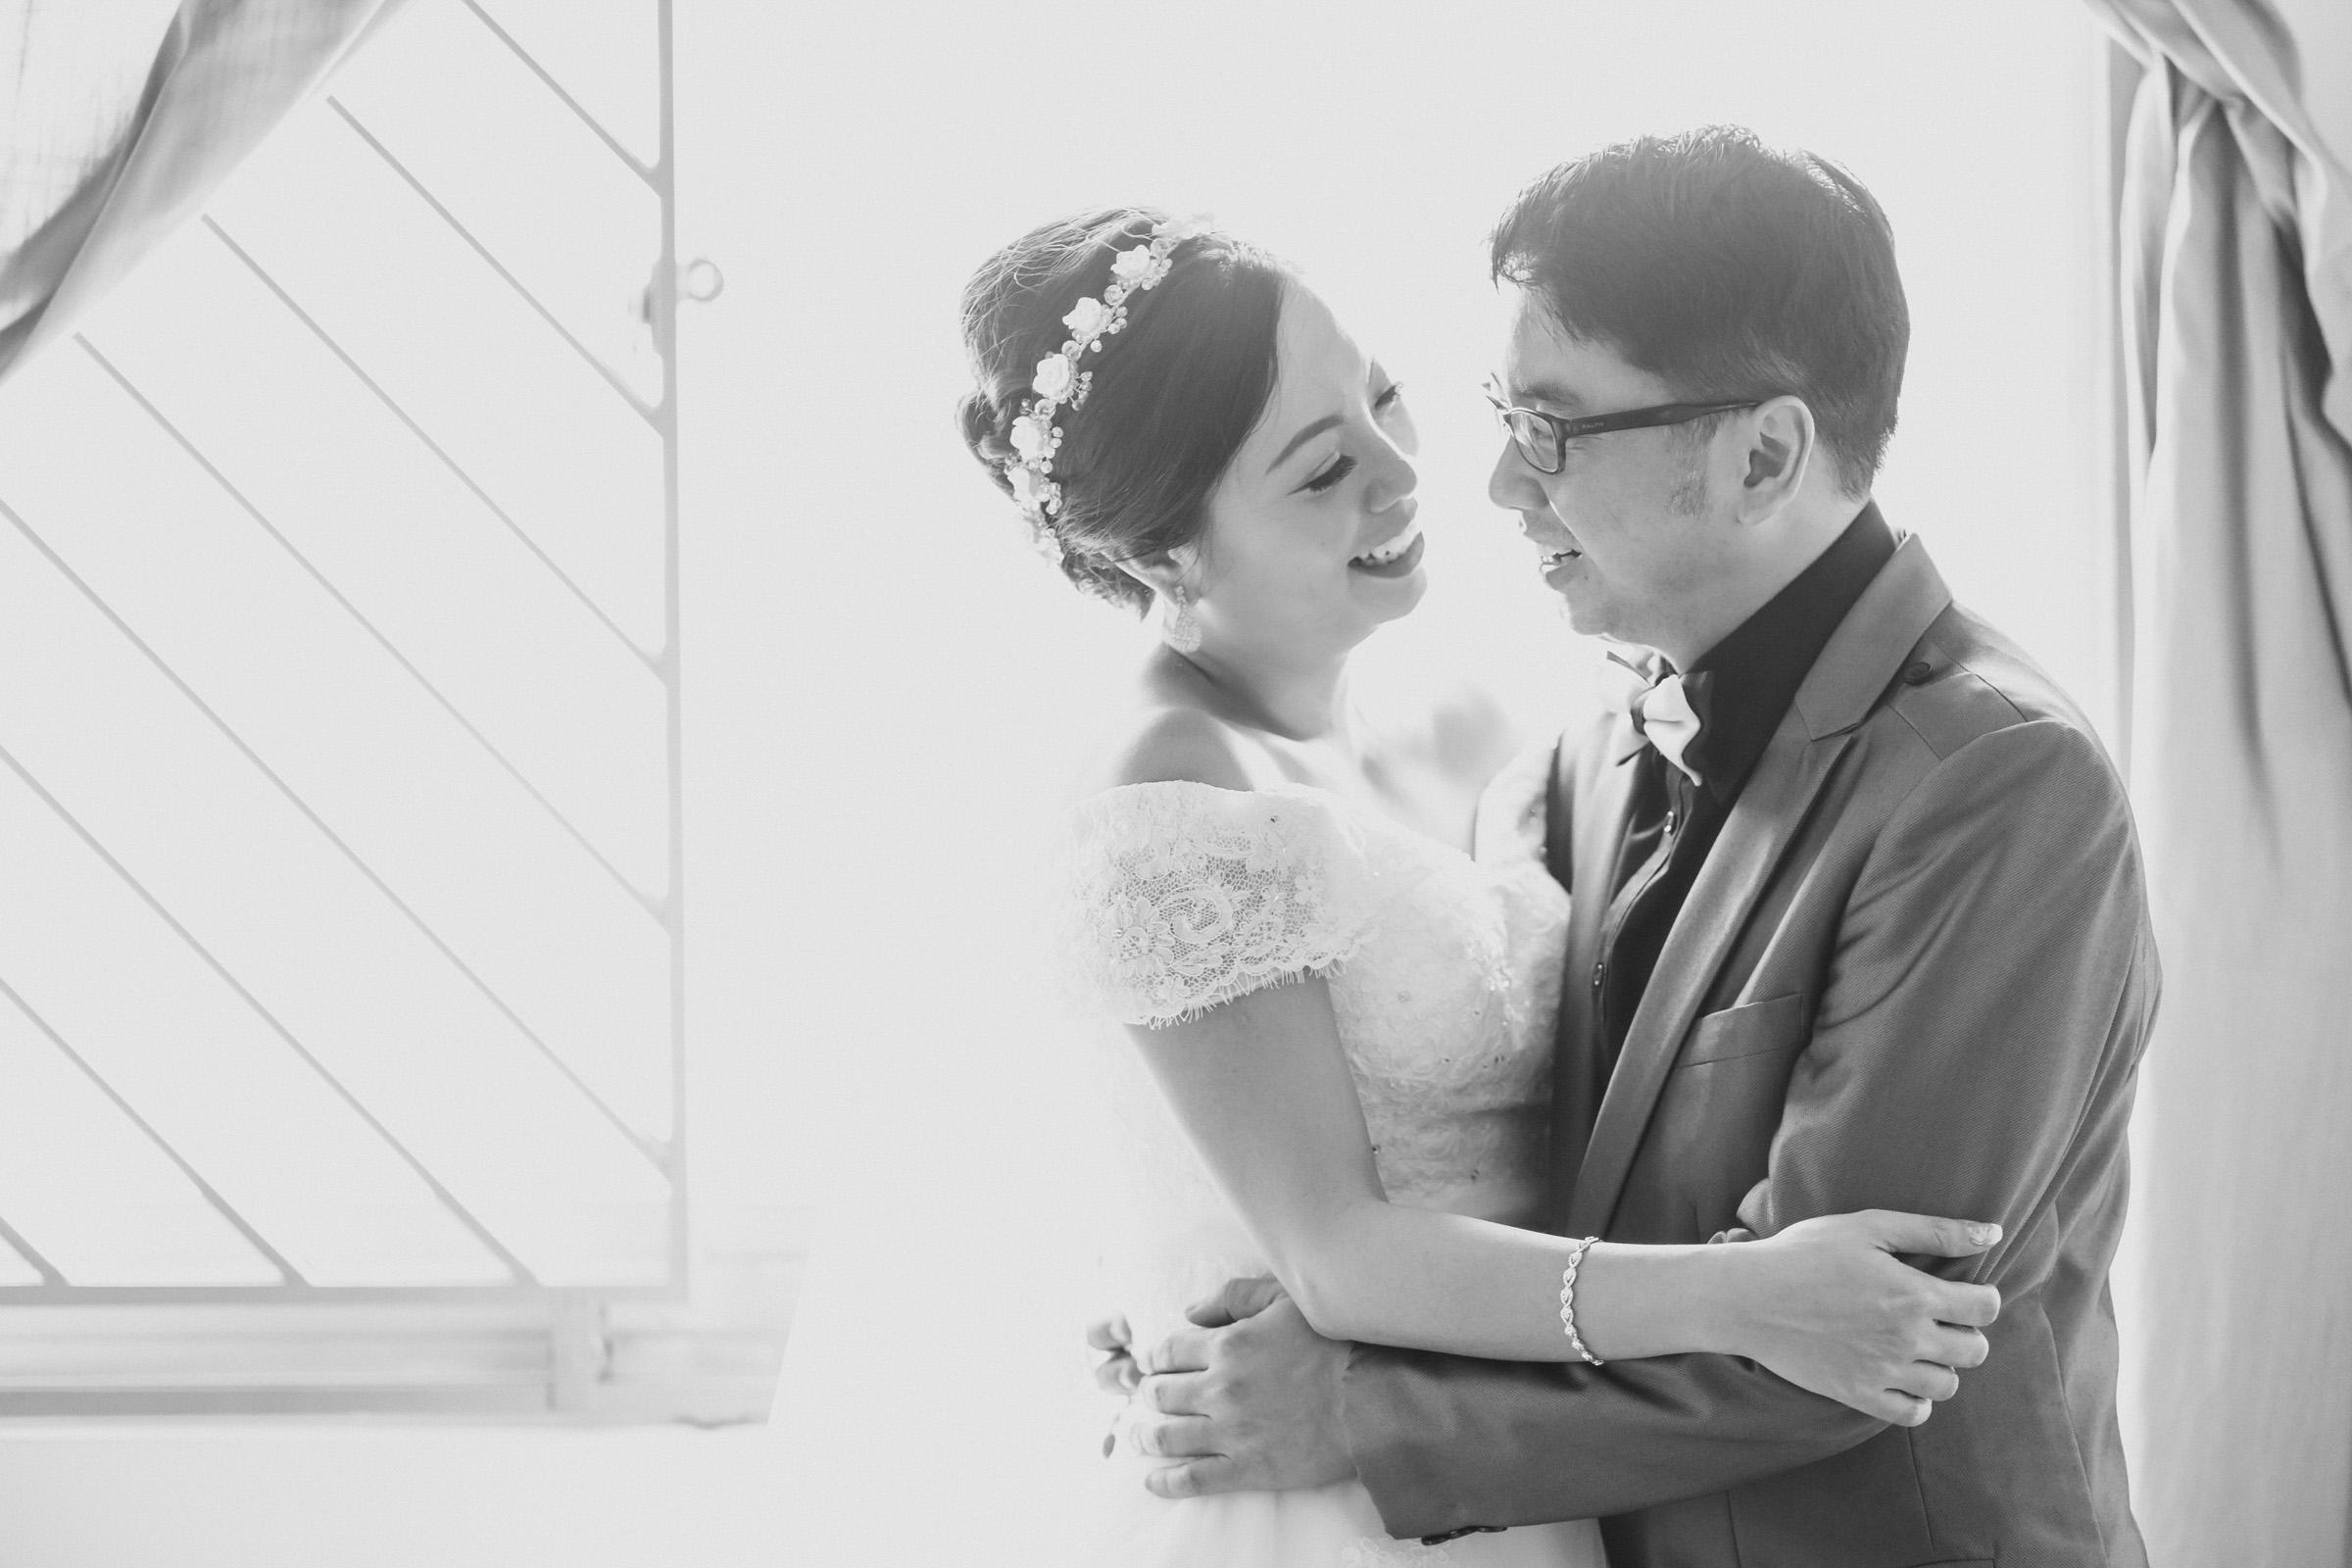 Steven_Jasmine_Wedding_Walldrobe Photography_Wedding shoots_Actual day wedding_Photographer (24)